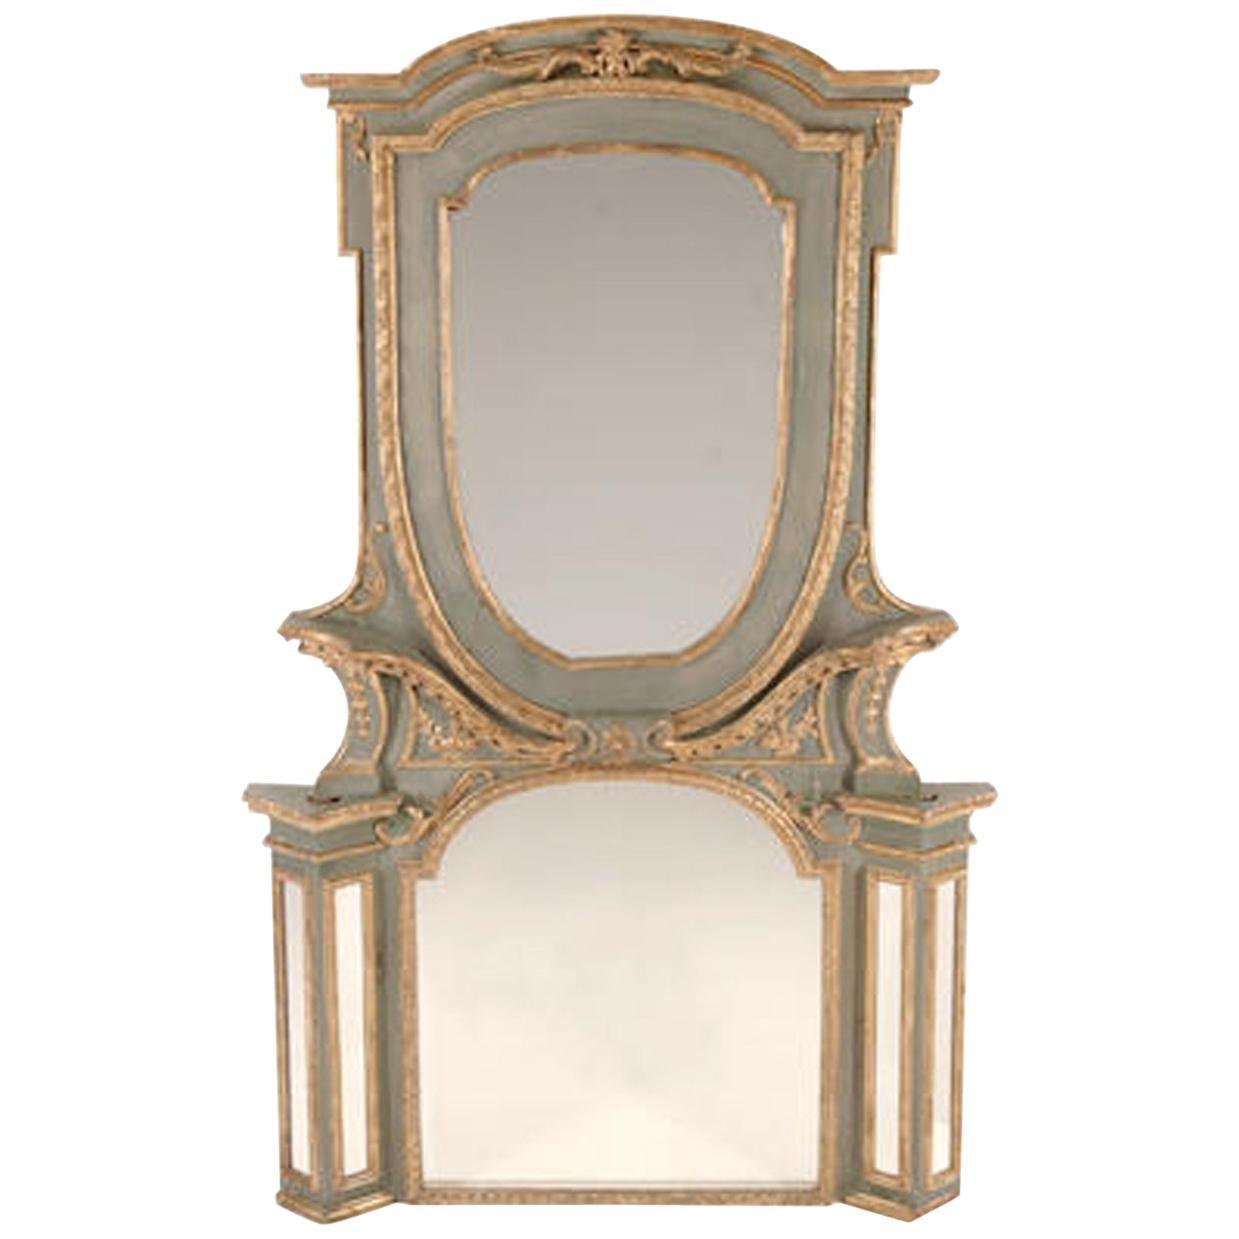 Italian Parcel-Gilt Green Painted Mirror, 19th Century